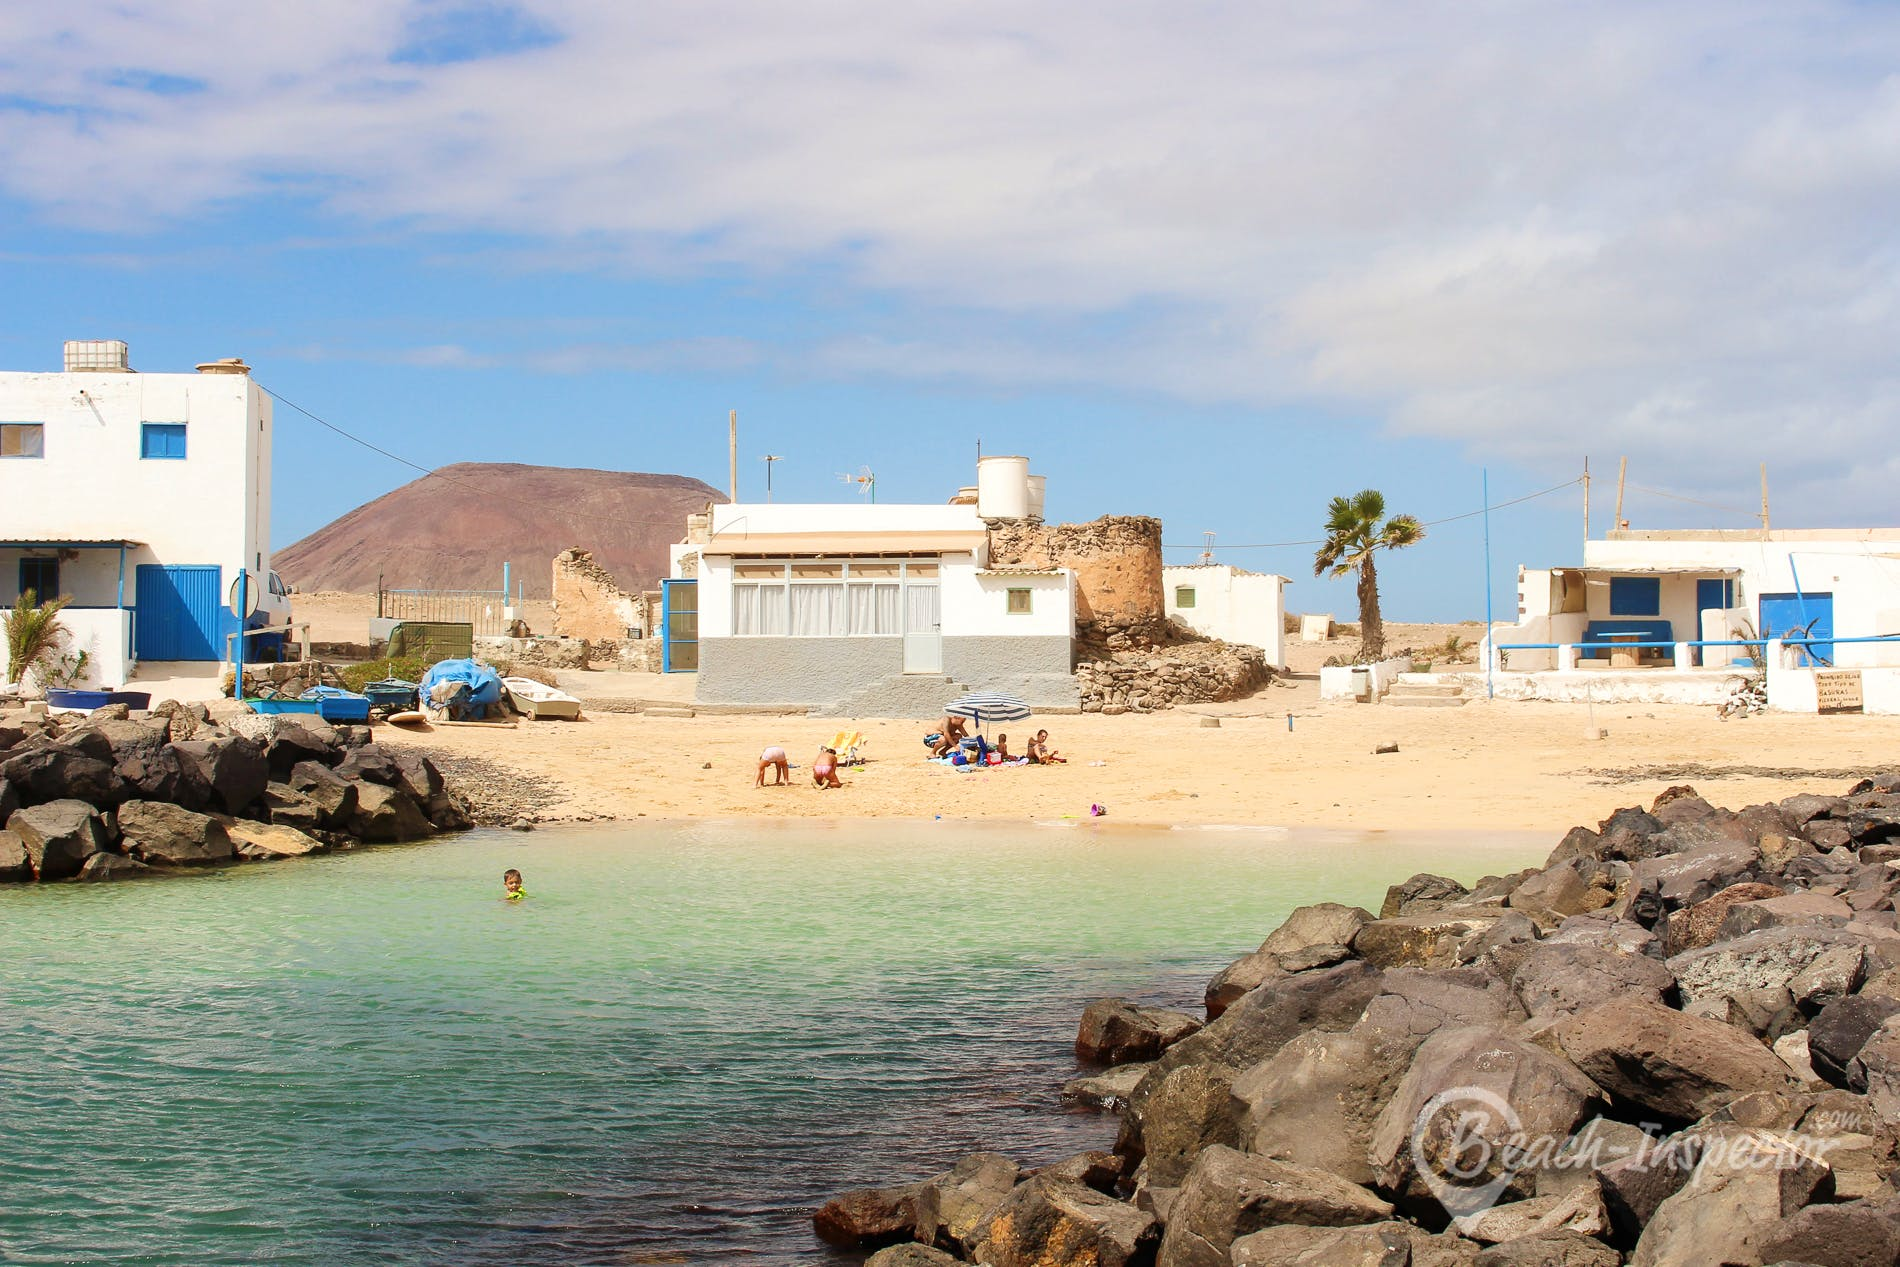 Beach Playa el Jablito, Fuerteventura, Spain